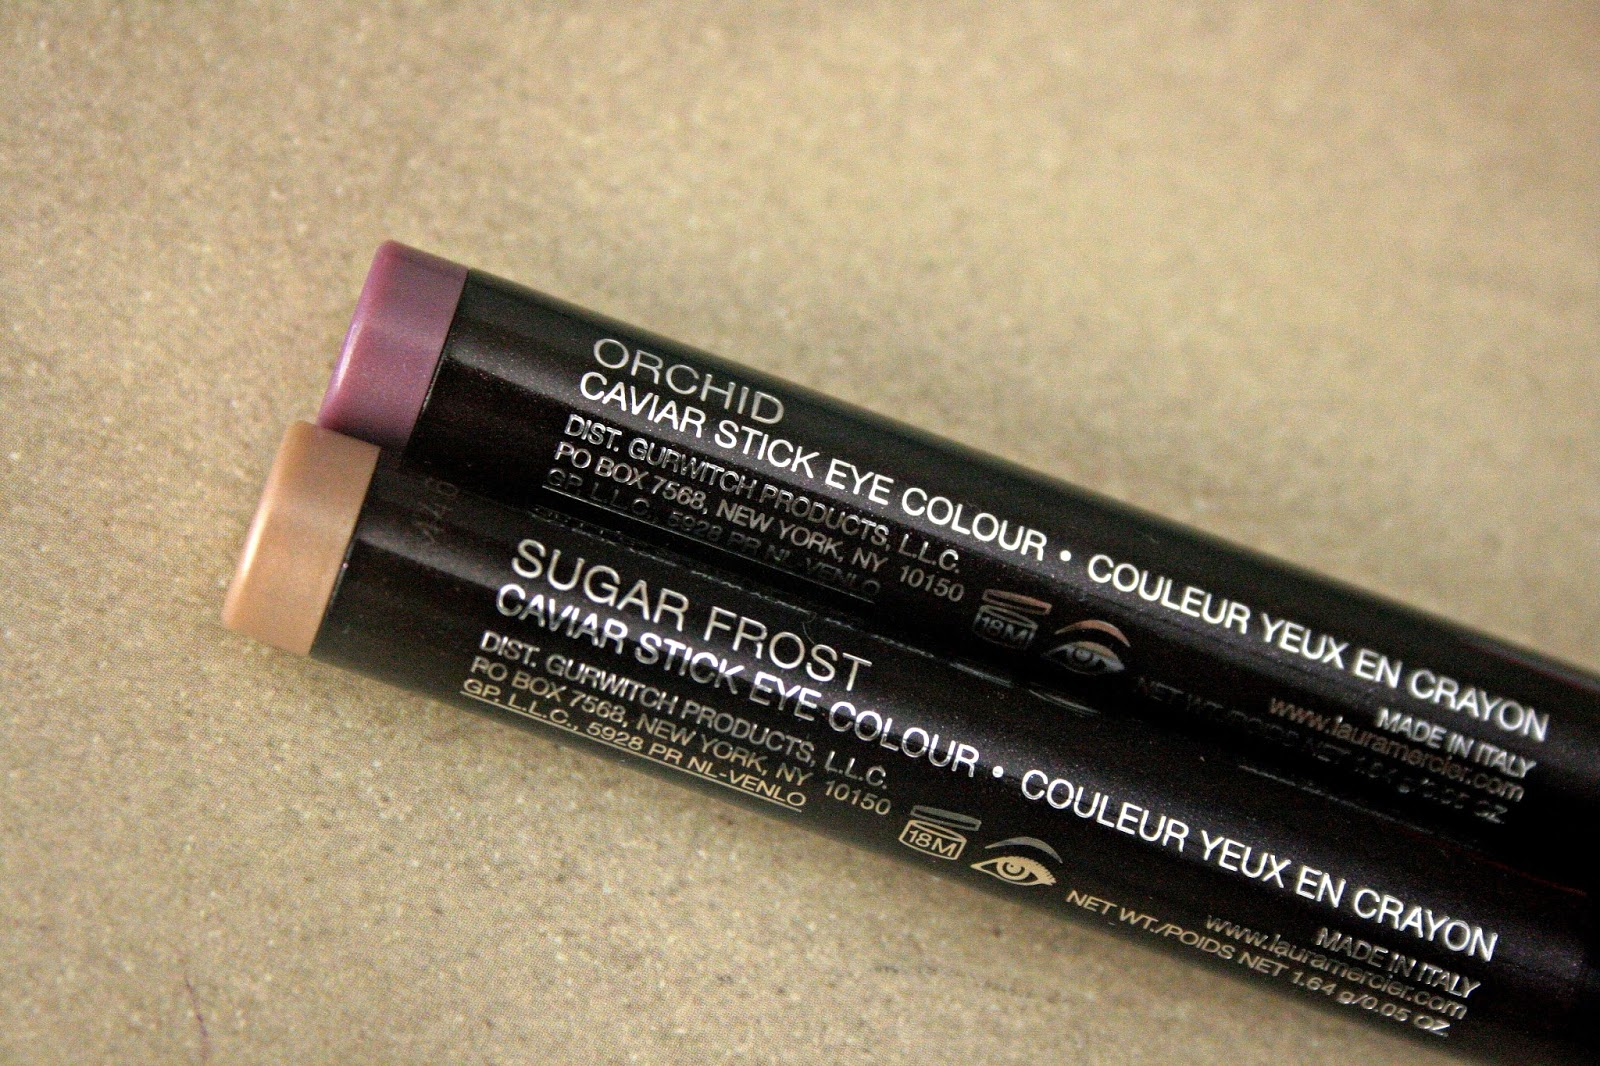 Laura Mercier Caviar Stick Eye Colors in Orchid & Sugar Frost